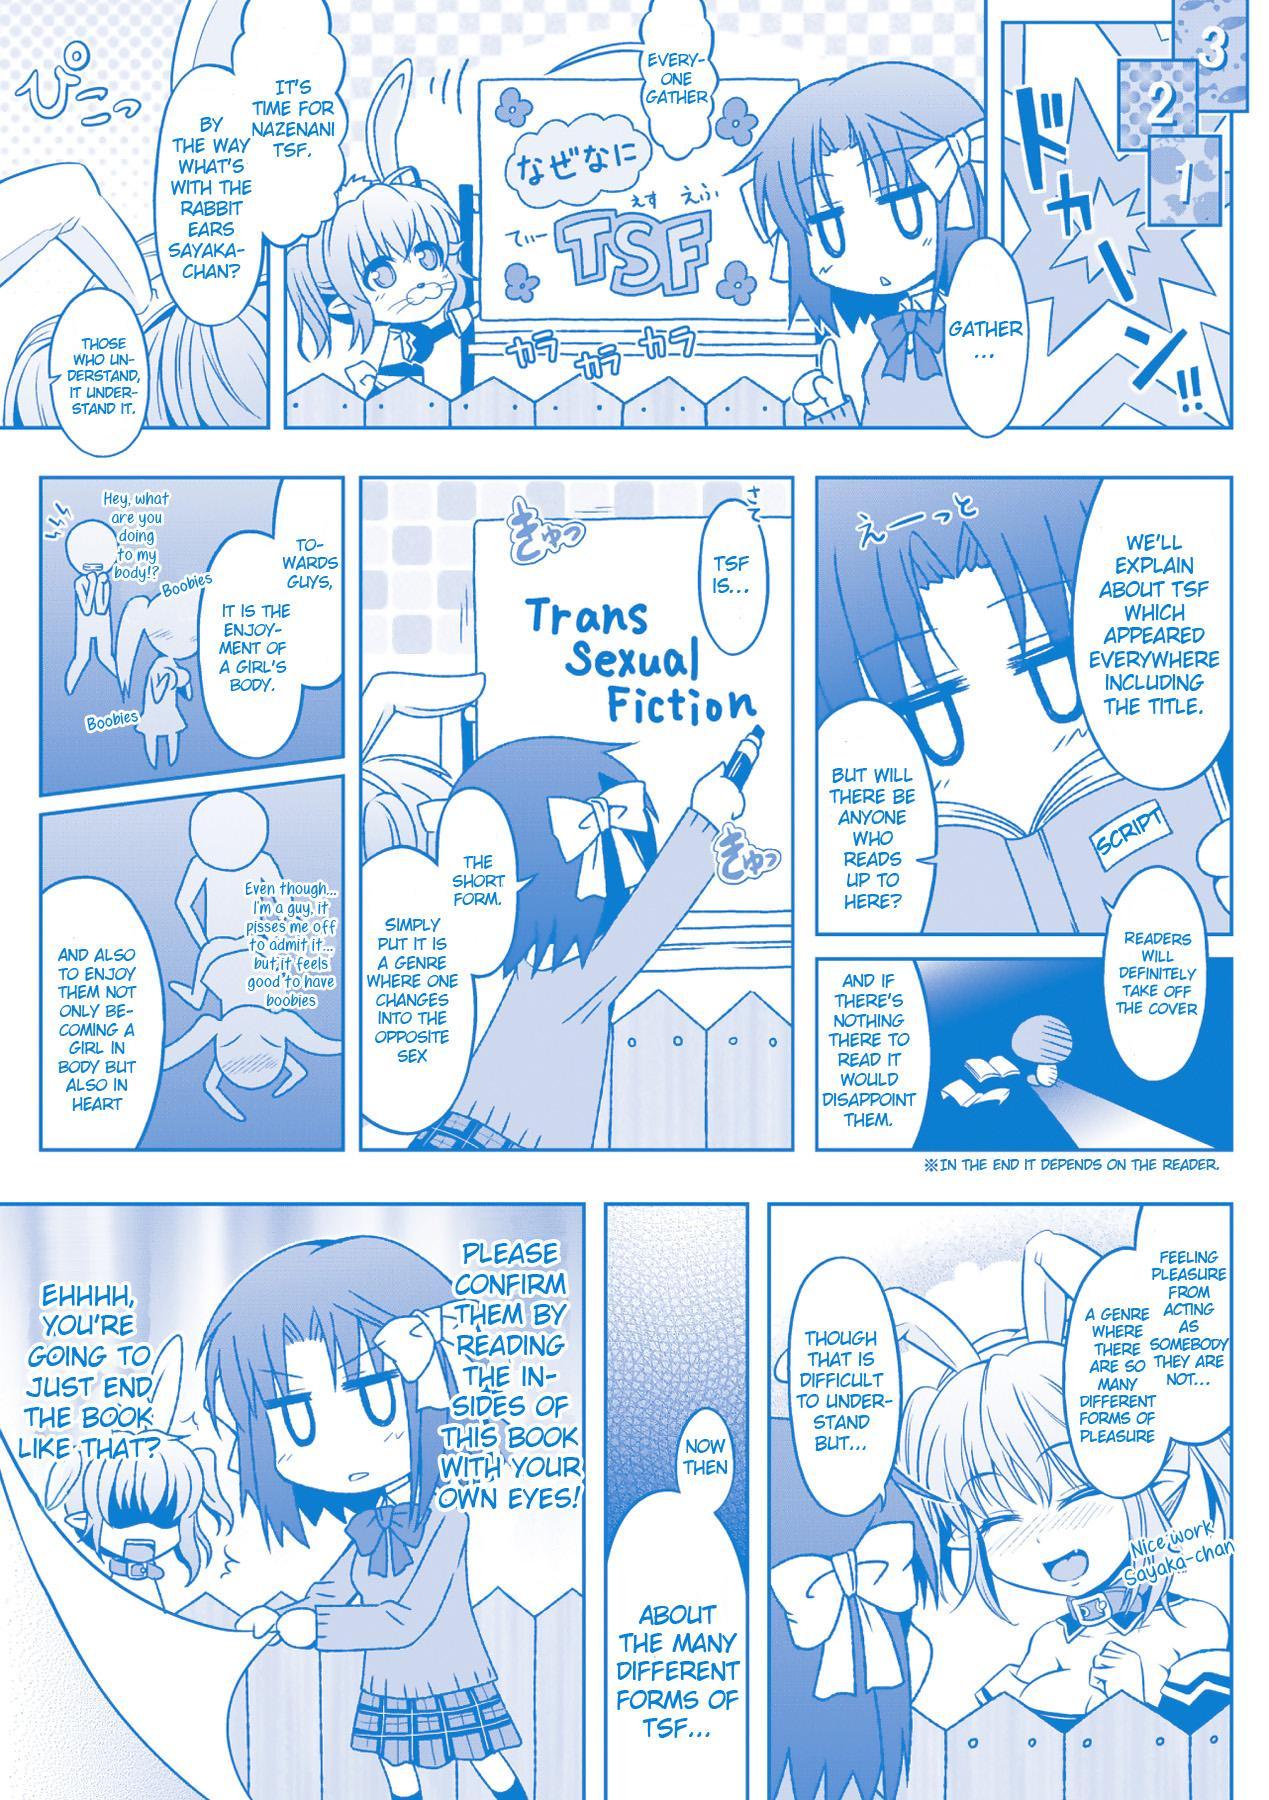 [Taniguchi-san] Girl Play - Trans-Sexual Fiction the Girls Play - ⚤TSF Catalog (English) {doujin-moe.us} 176